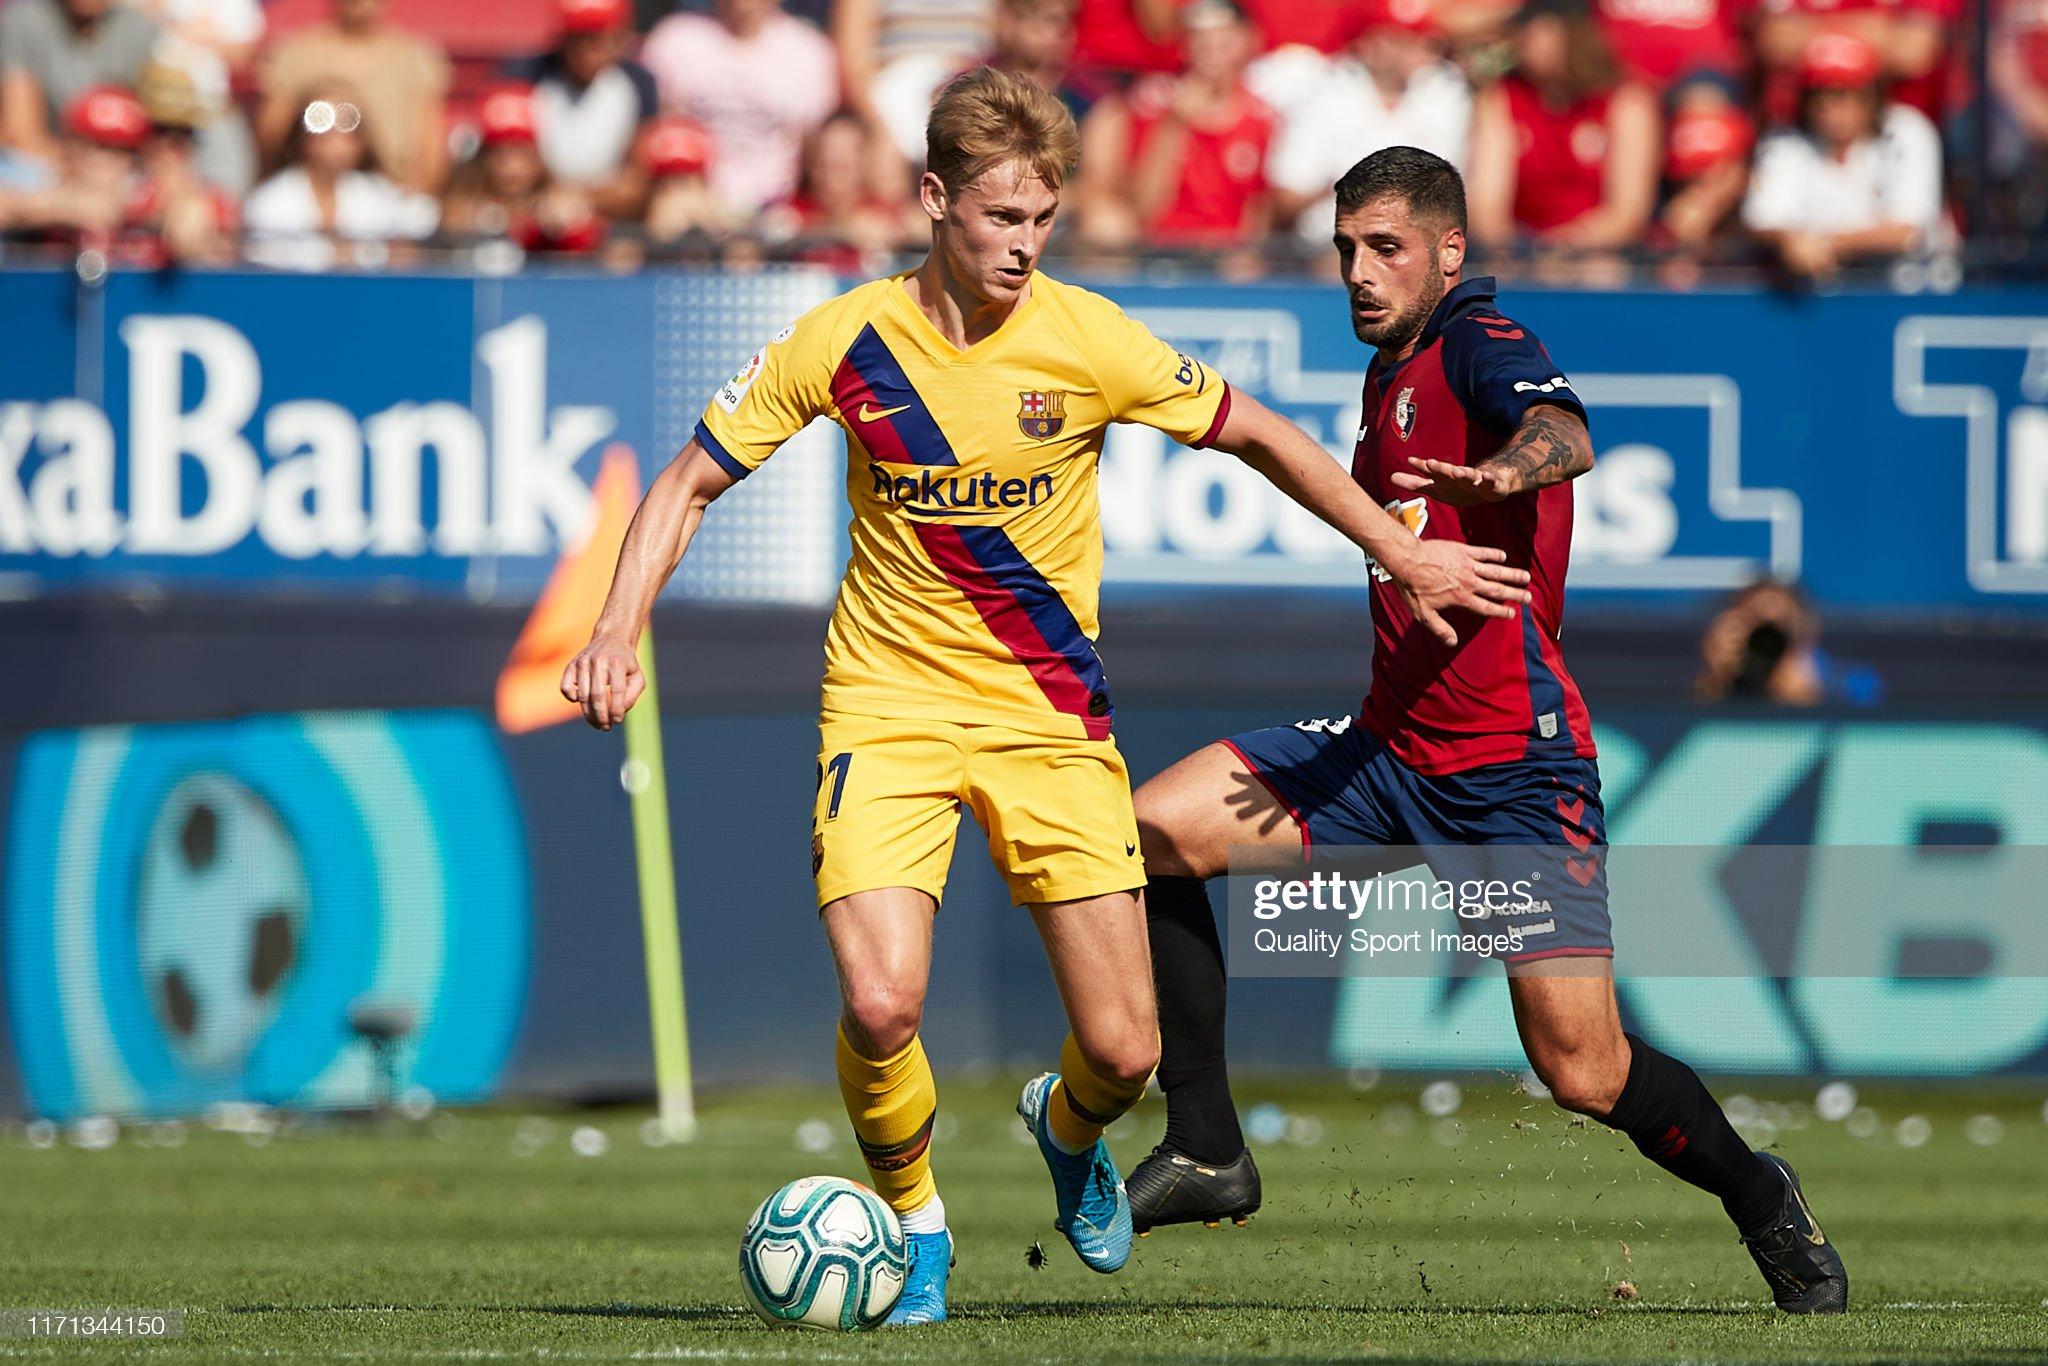 صور مباراة : أوساسونا - برشلونة 2-2 ( 31-08-2019 )  Frenkie-de-jong-of-fc-barcelona-in-action-during-the-liga-match-ca-picture-id1171344150?s=2048x2048